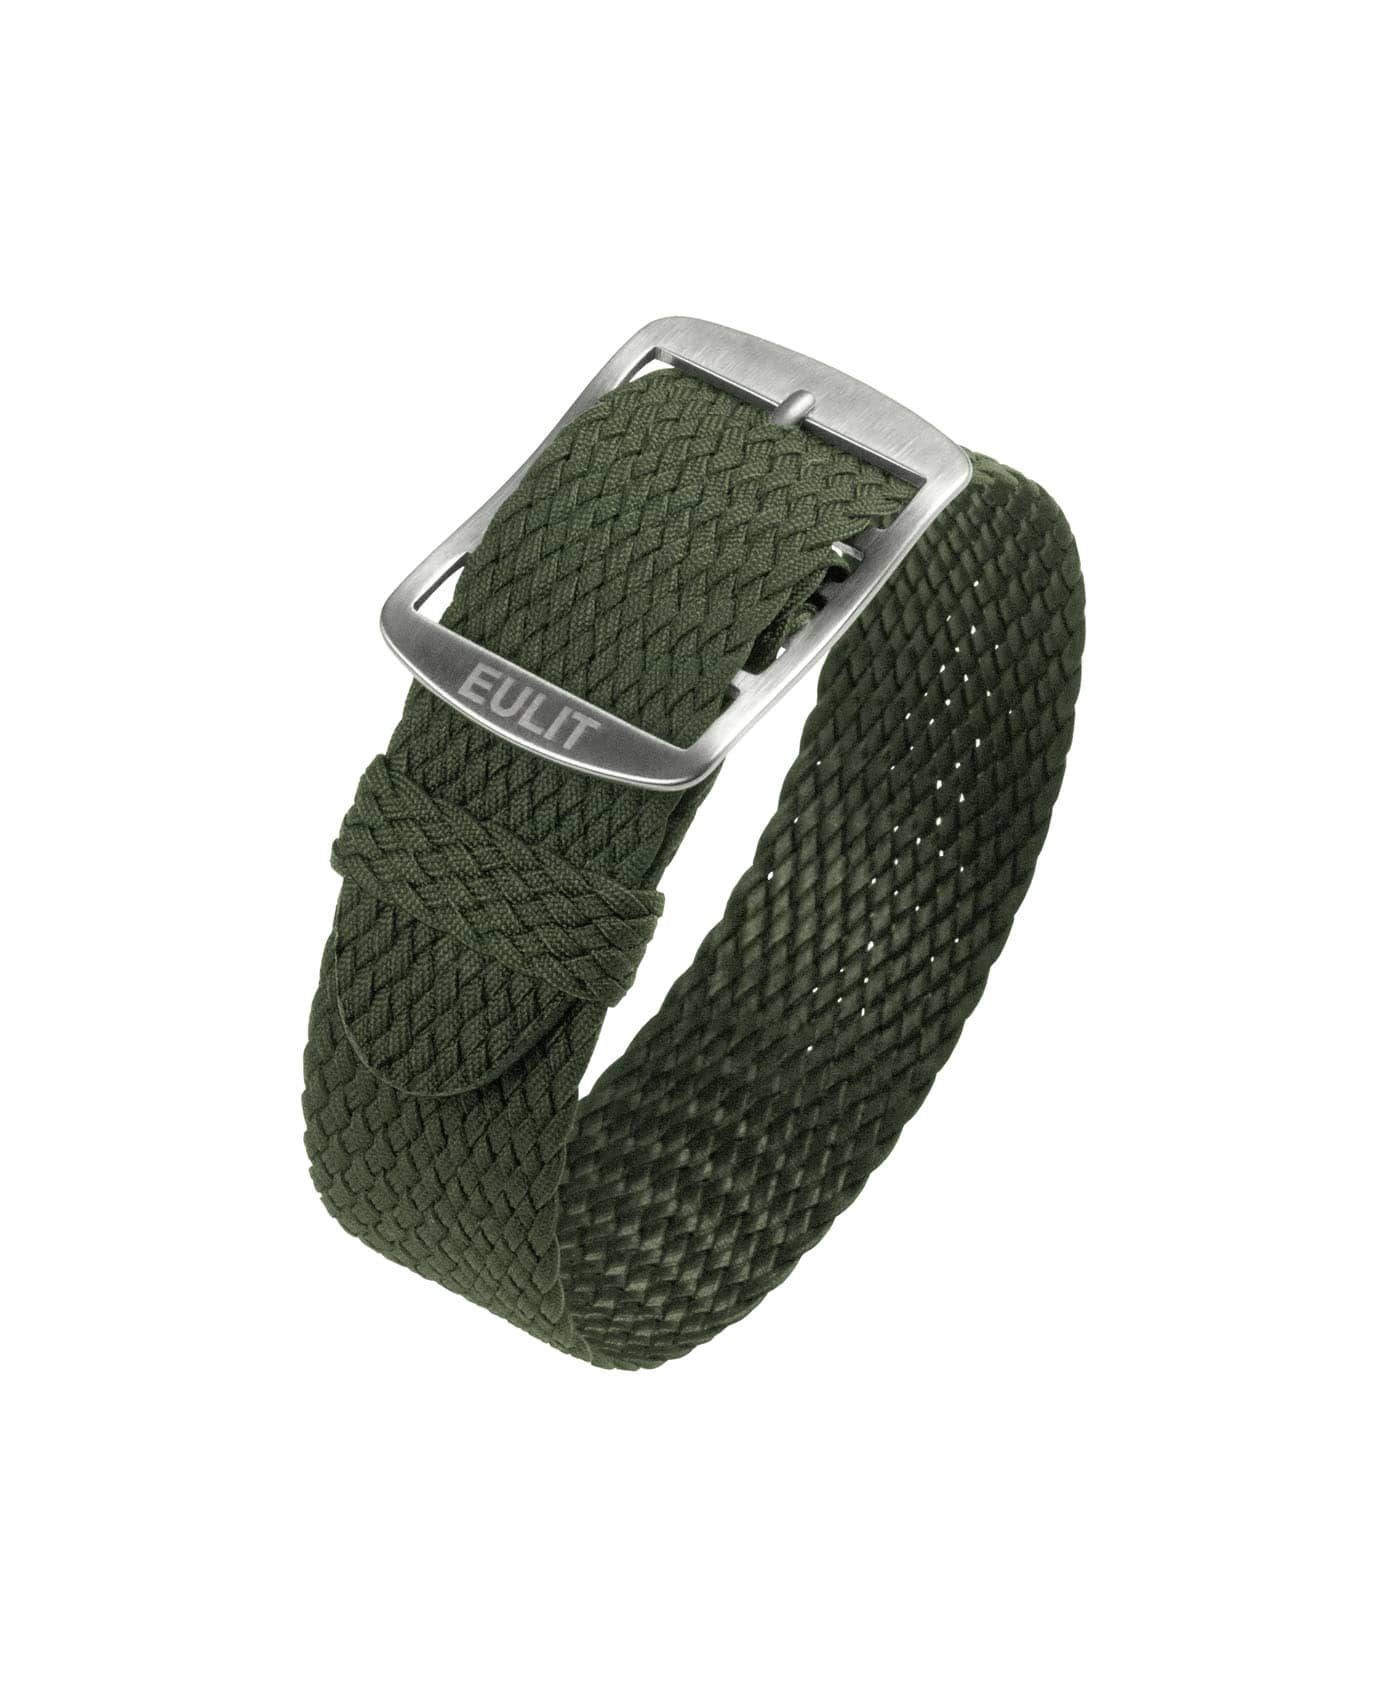 Eulit Baltic Perlon Watch Strap_Olive Green